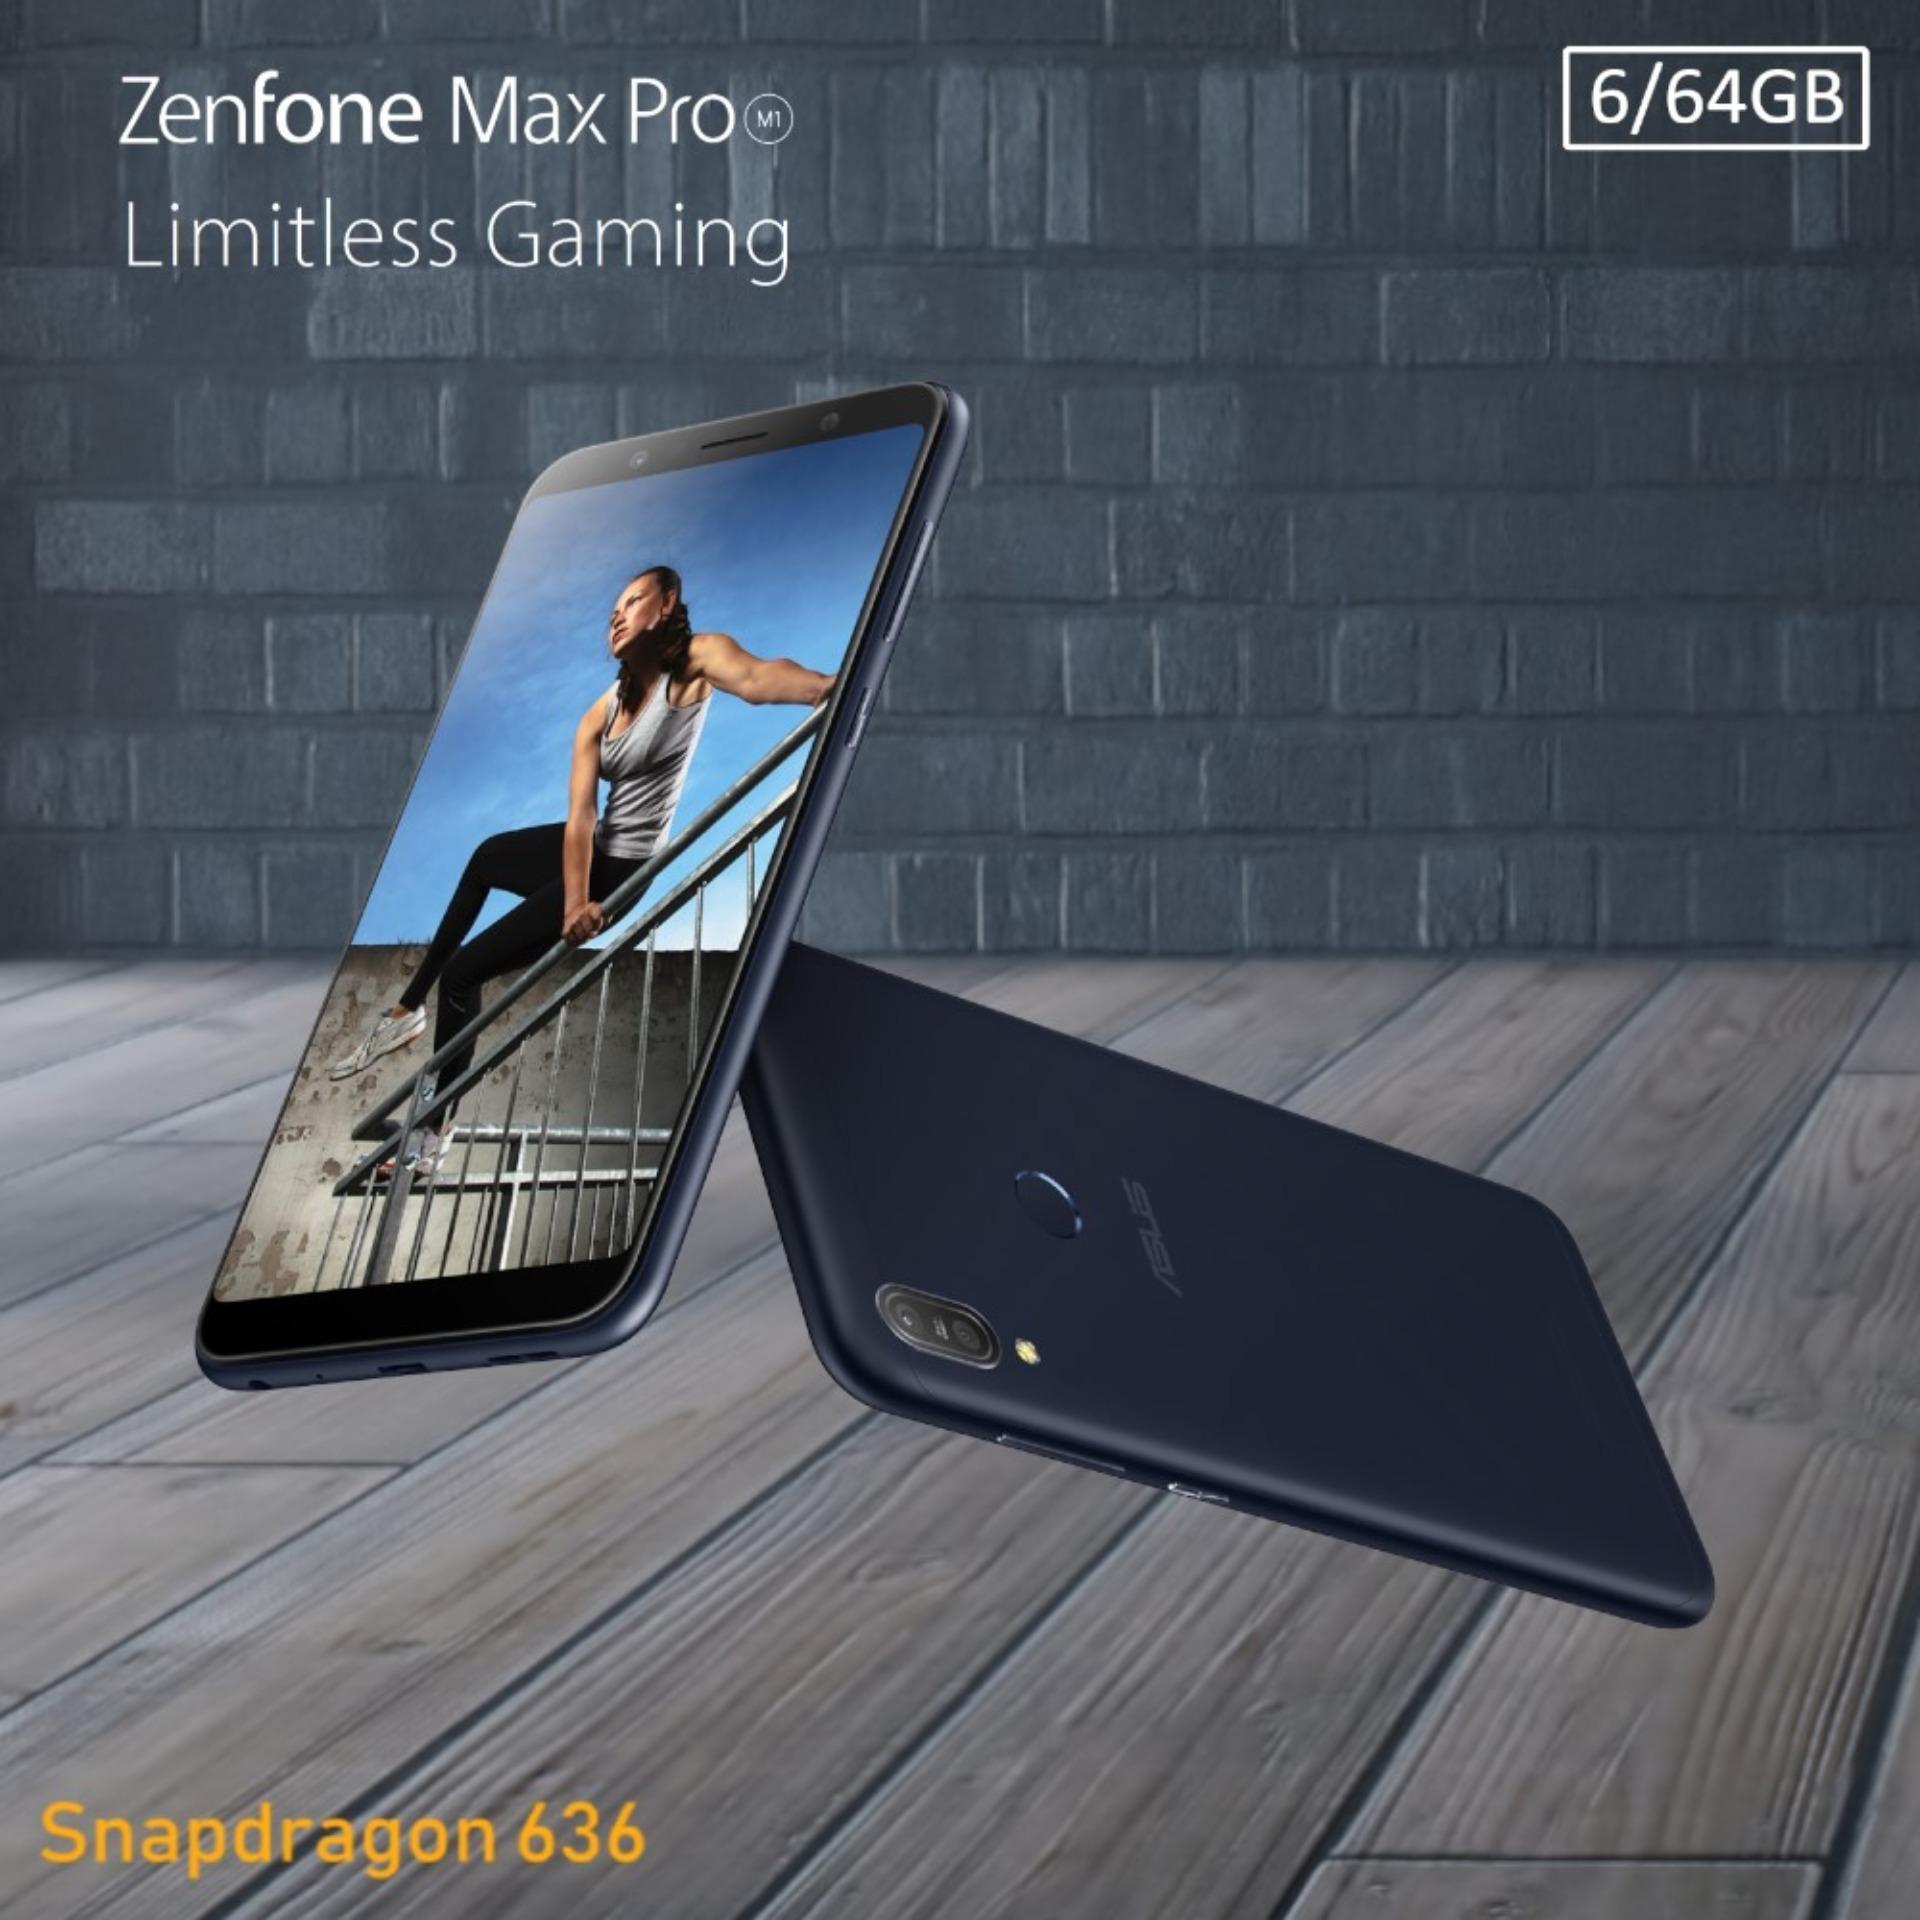 Asus Zenfone Max Pro M1 ZB602KL 6/64 Snapdragon 636 5000mAh Resmi